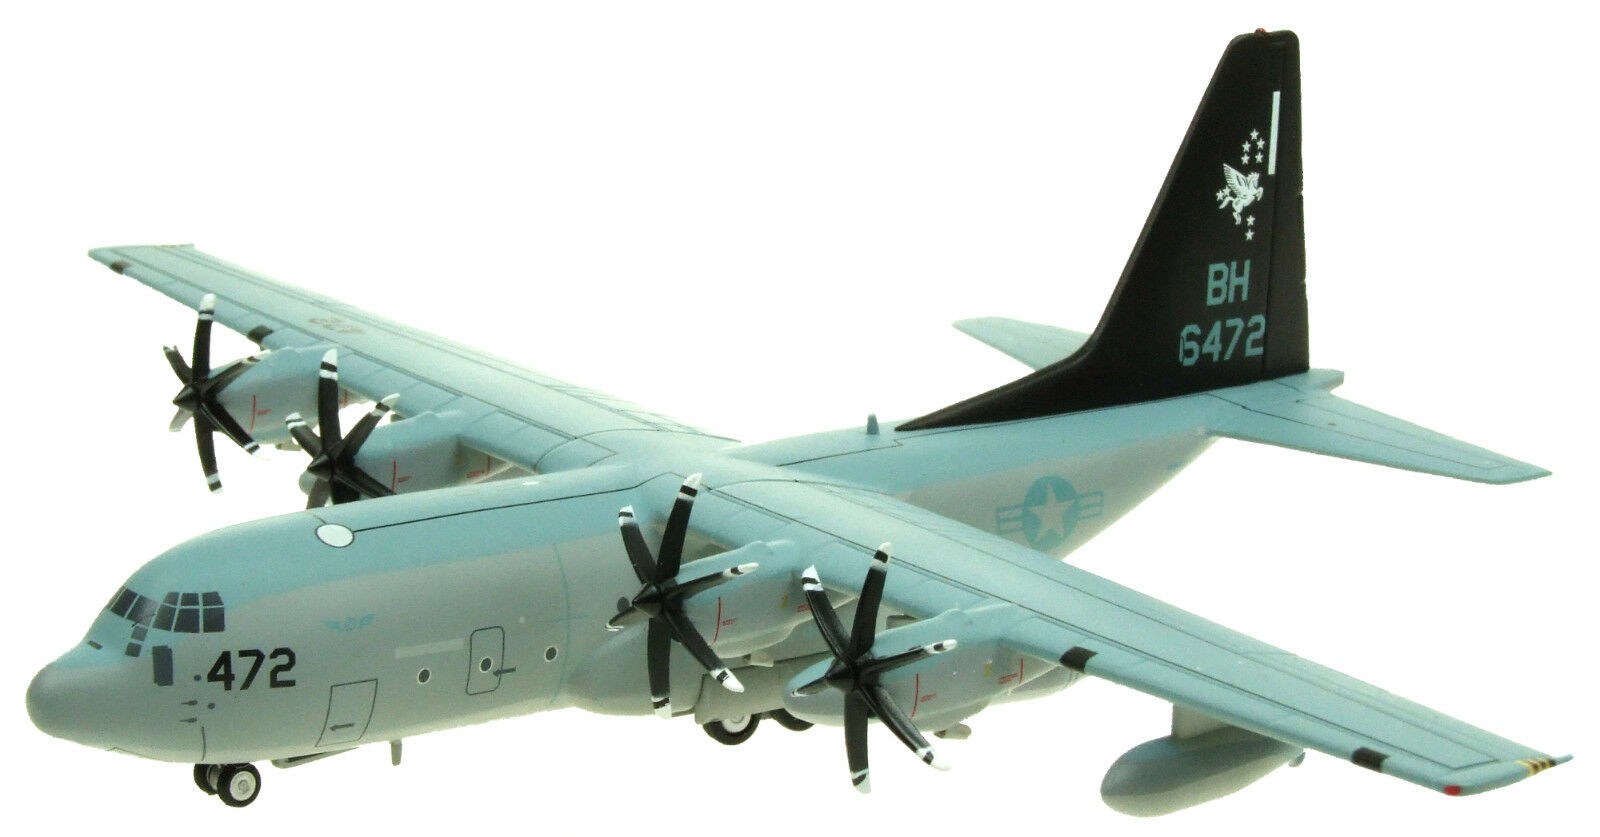 Inflight 200 If1301116 1 200 US Marines Kc-130j Hercules